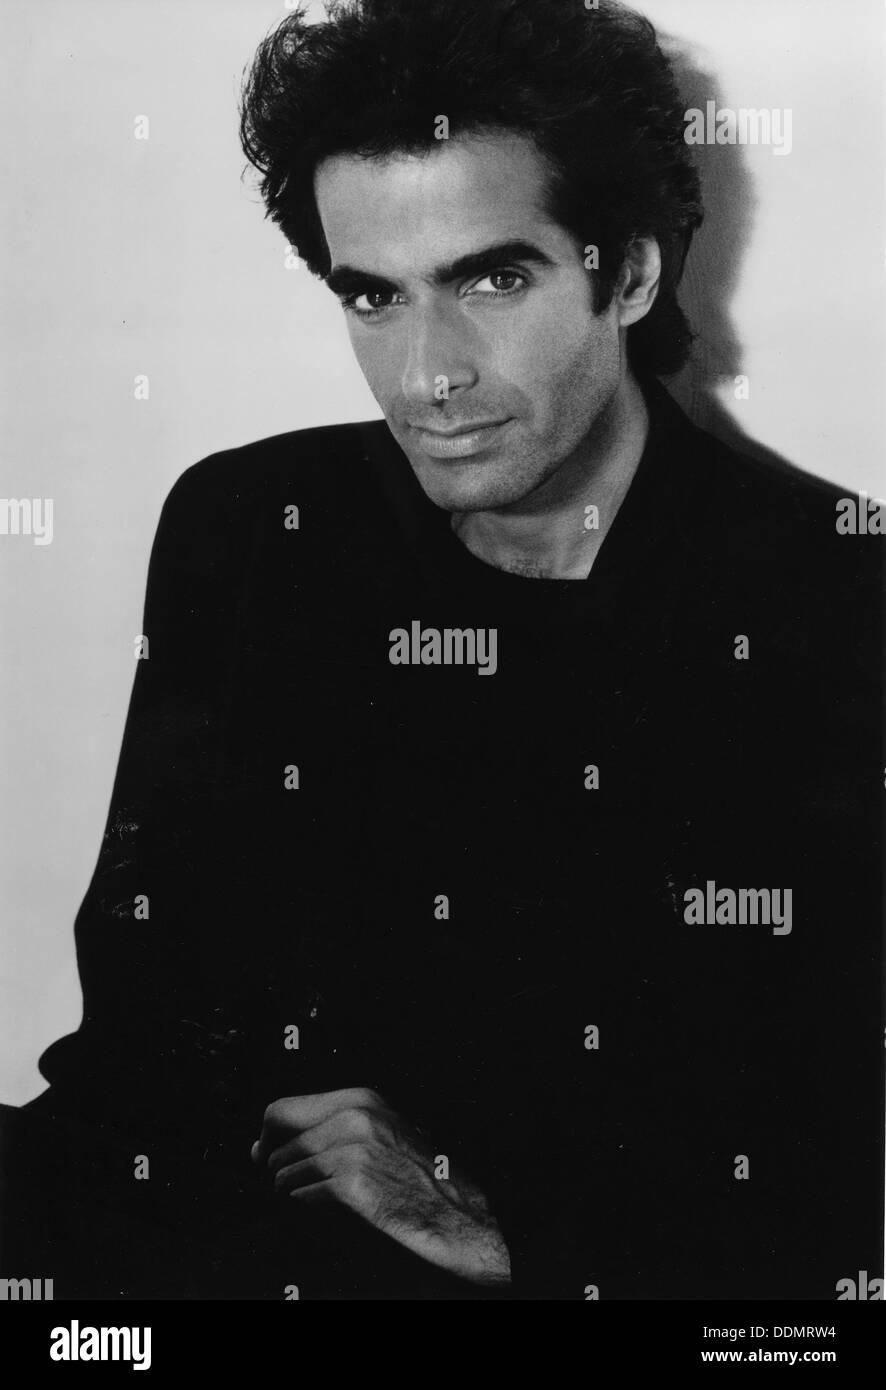 David Copperfield (1956- ), American Illusionist, 1994. - Stock Image